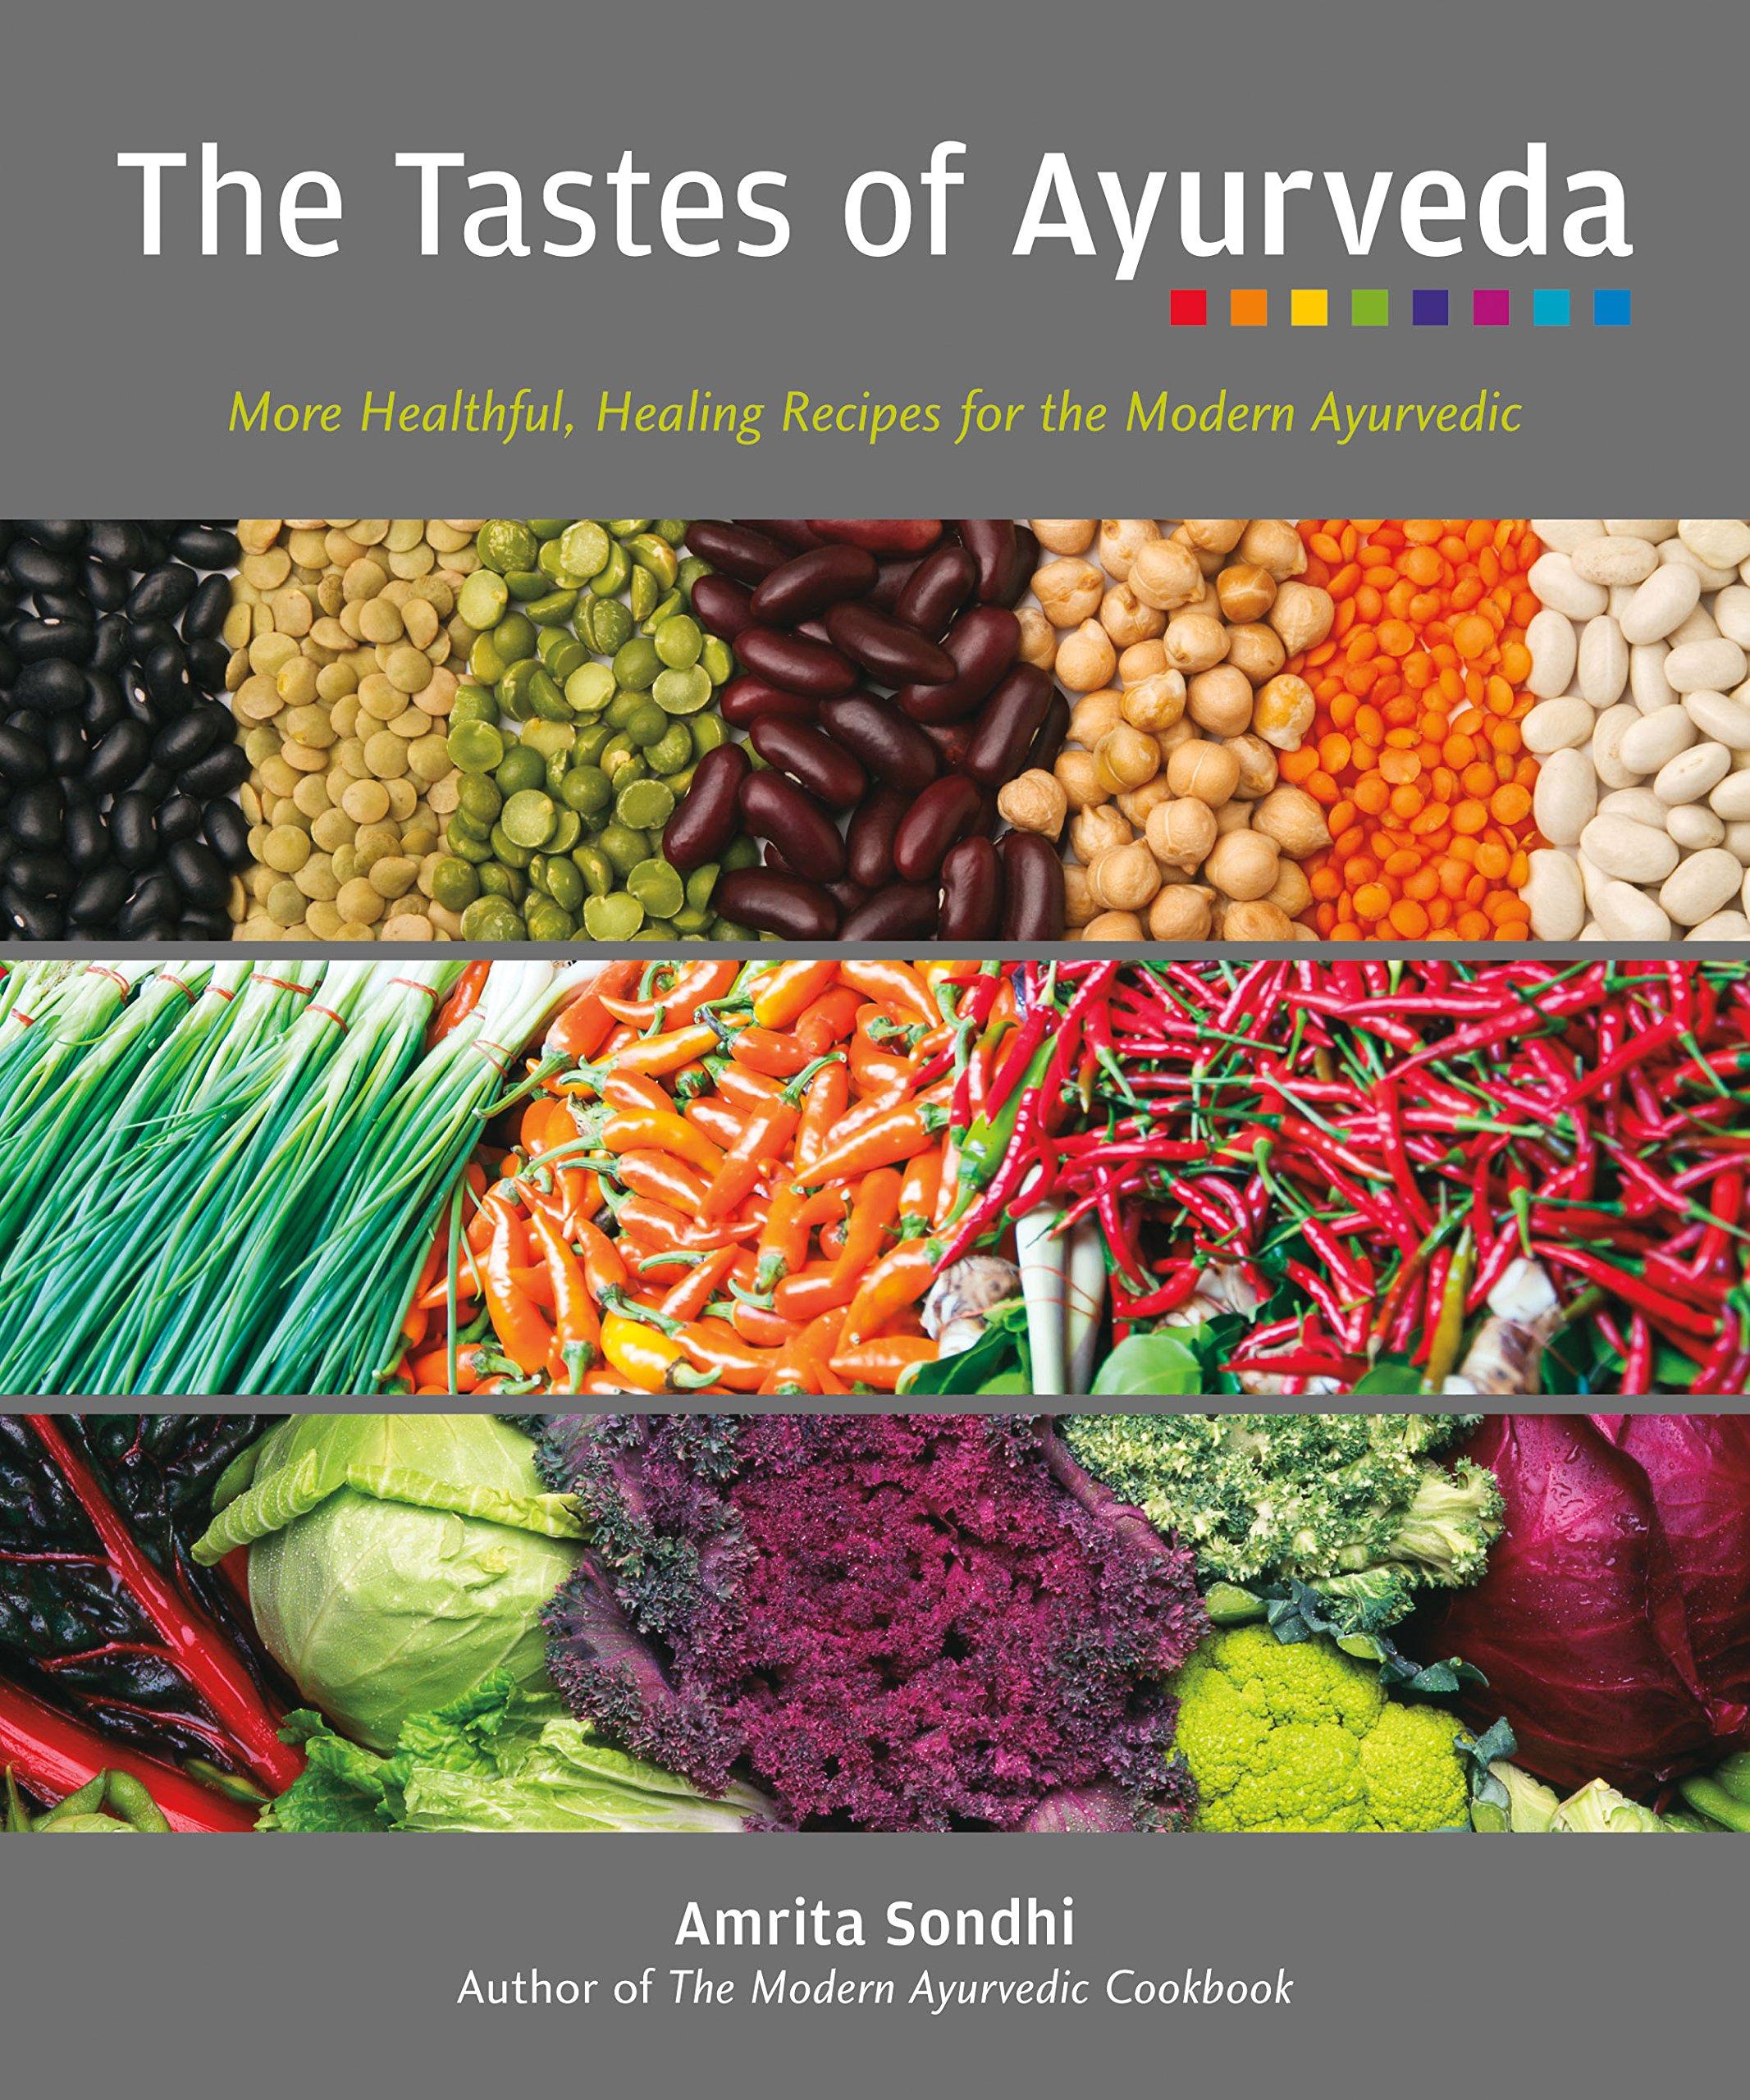 Download The Tastes of Ayurveda: More Healthful, Healing Recipes for the Modern Ayurvedic pdf